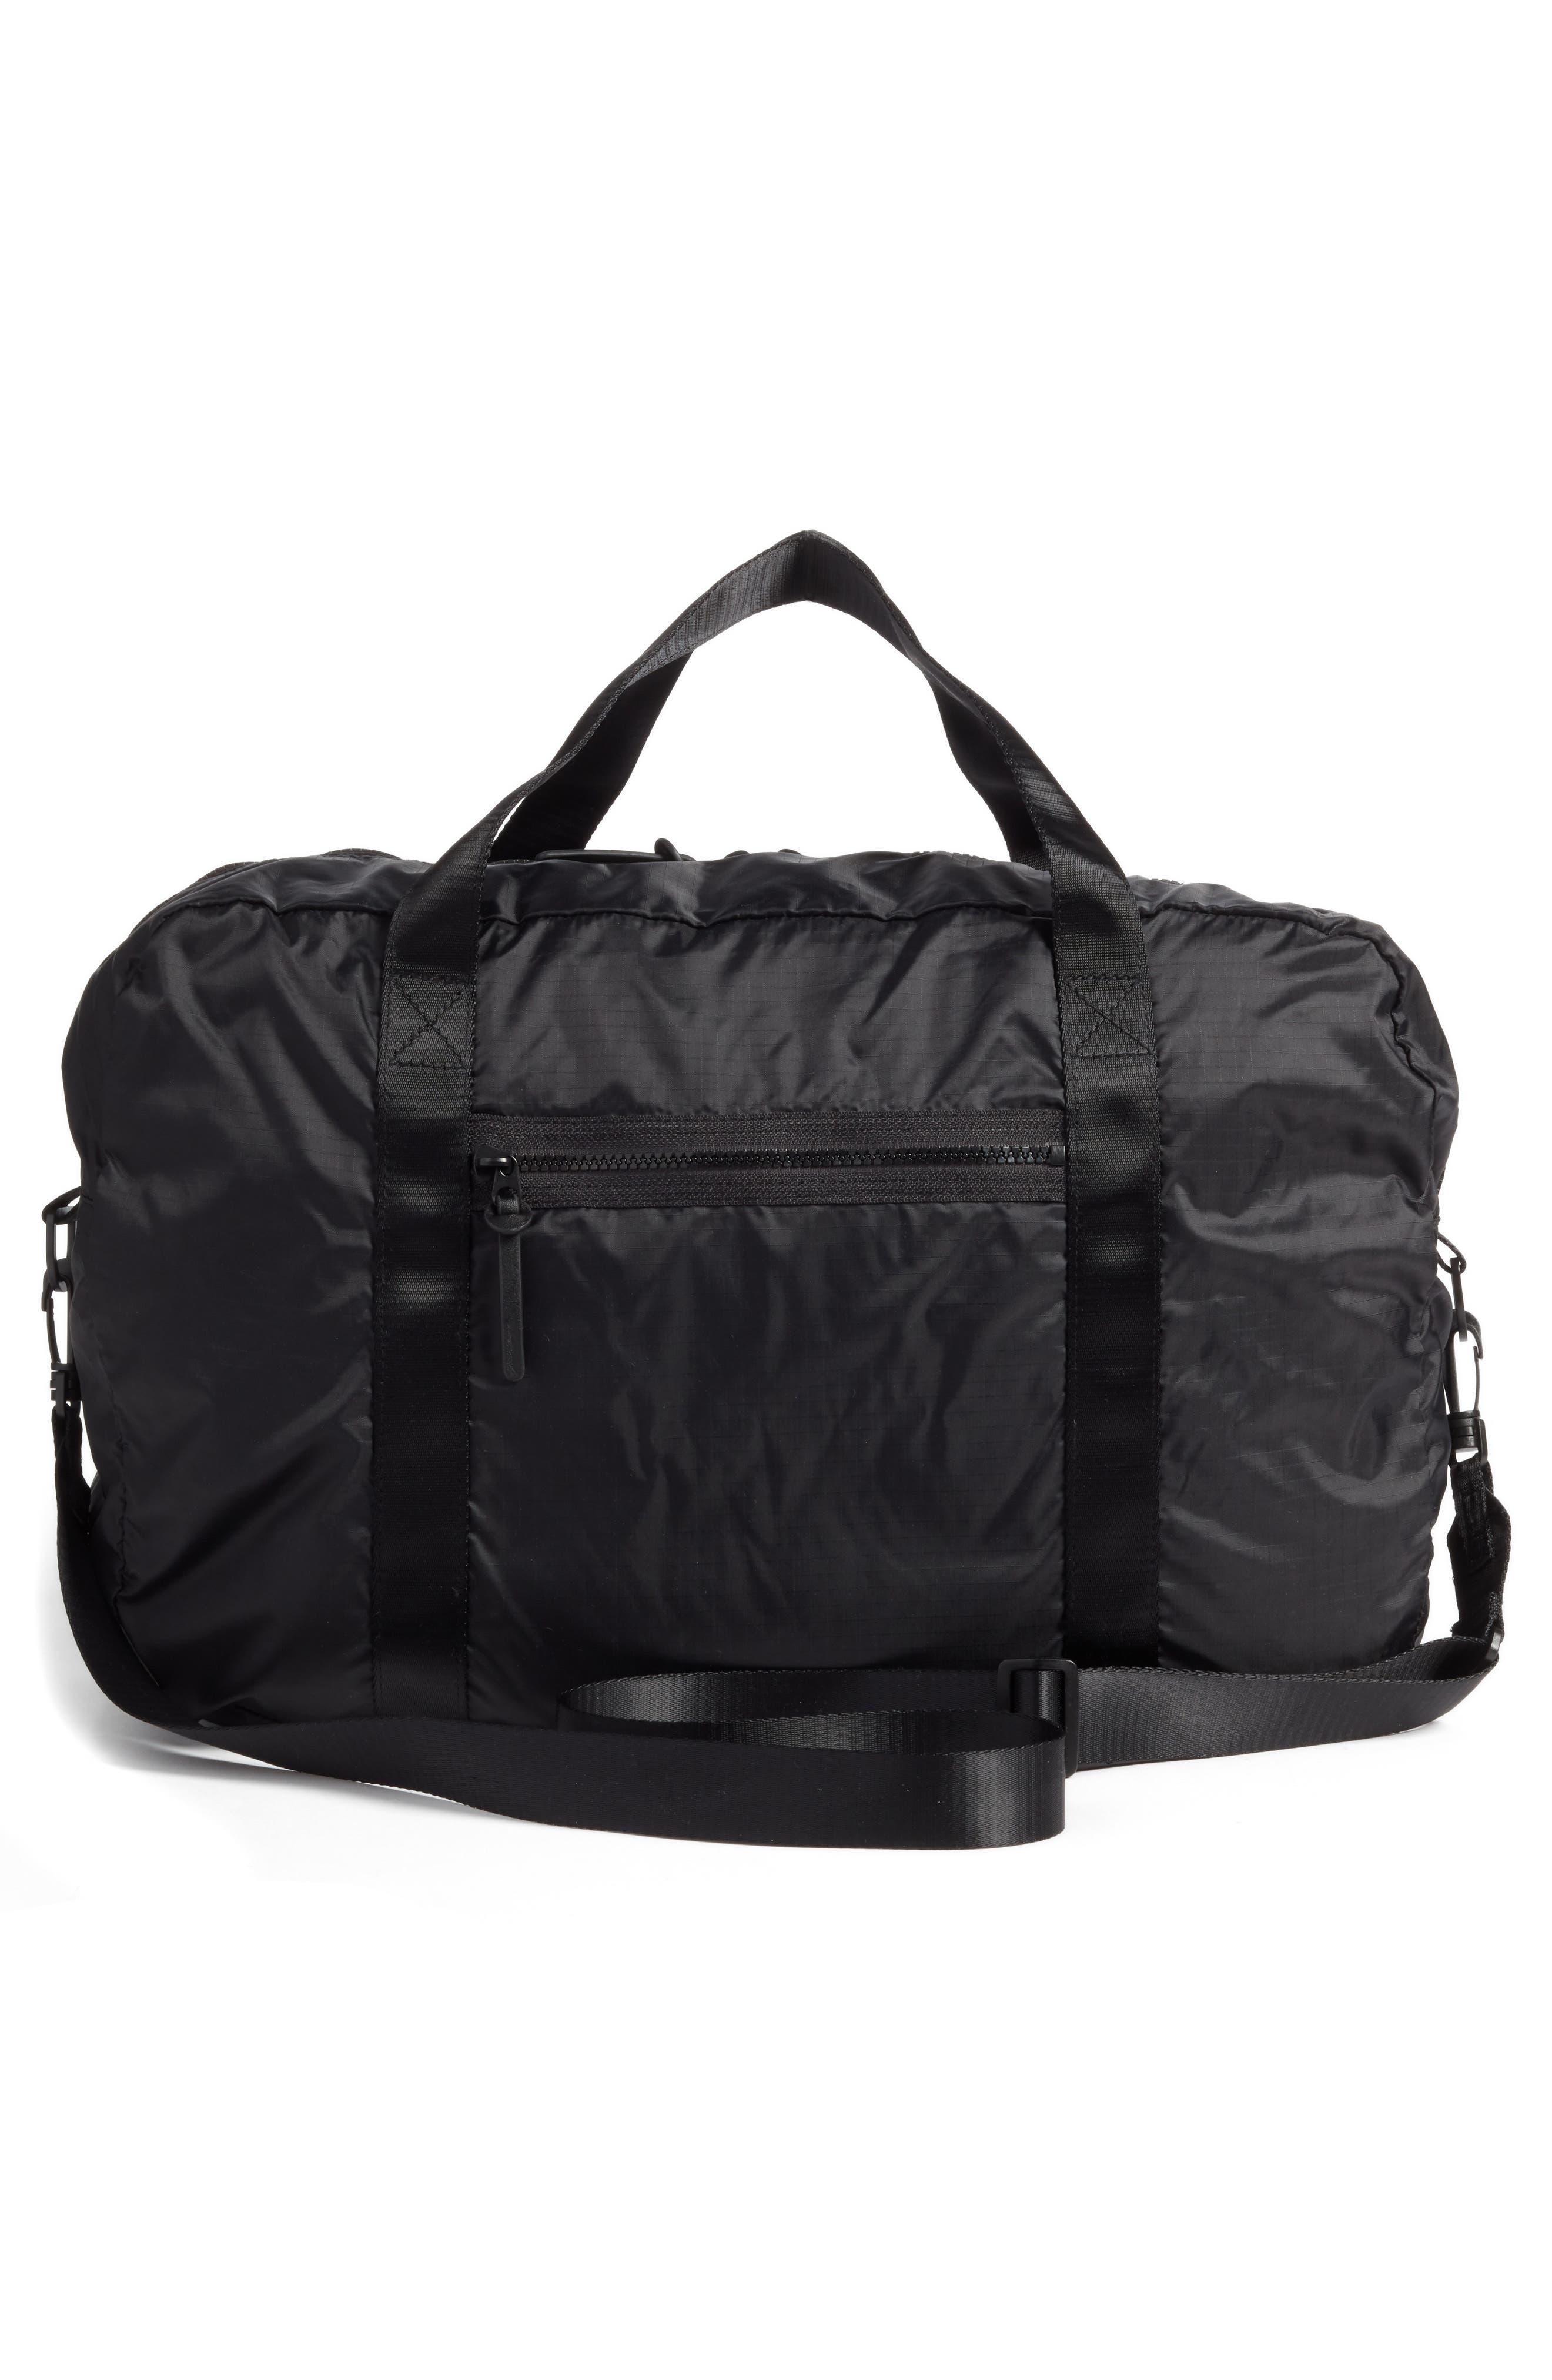 NORDSTROM, Packable Nylon Duffel Bag, Alternate thumbnail 4, color, BLACK